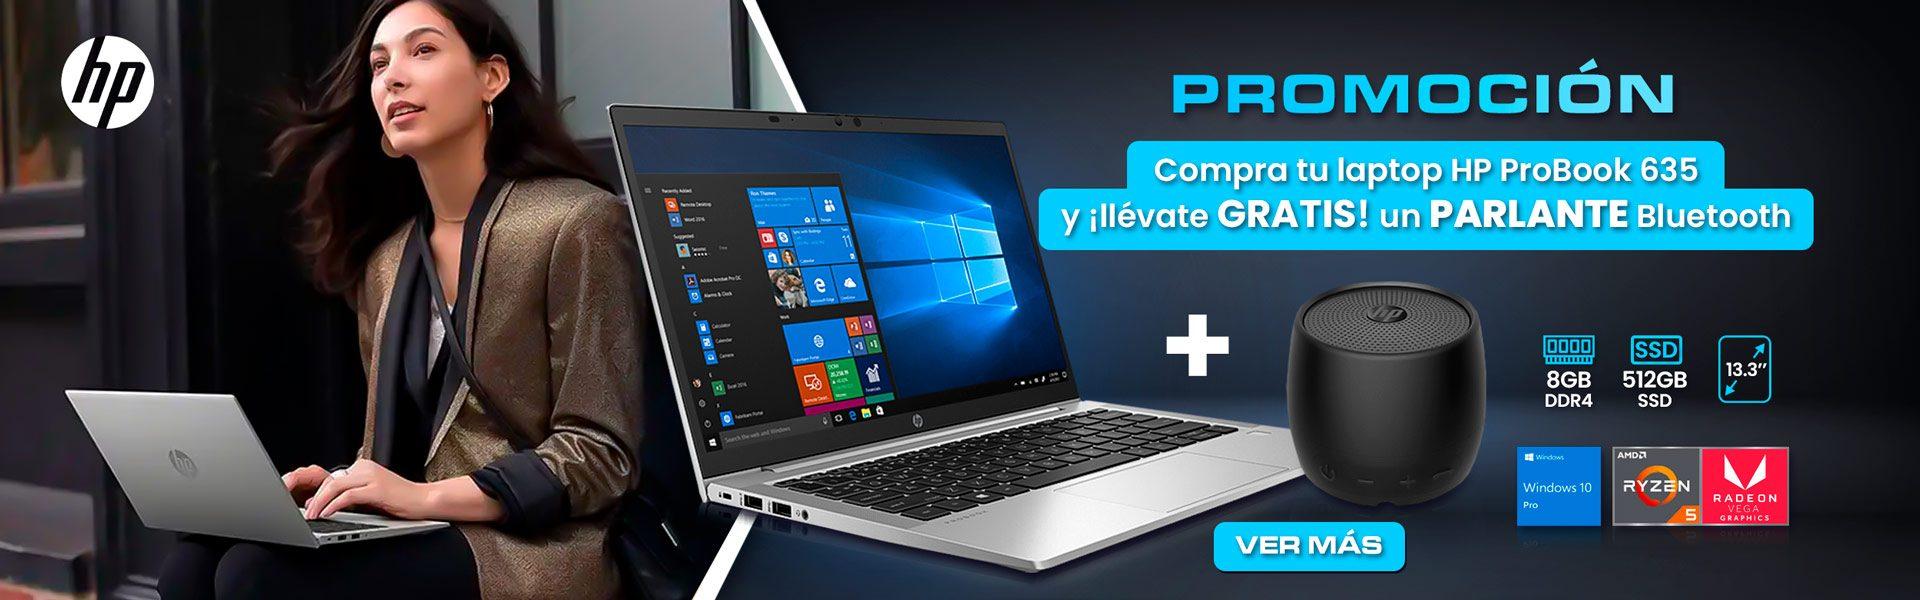 Banner_Desktop_HP_Laptop_Parlante